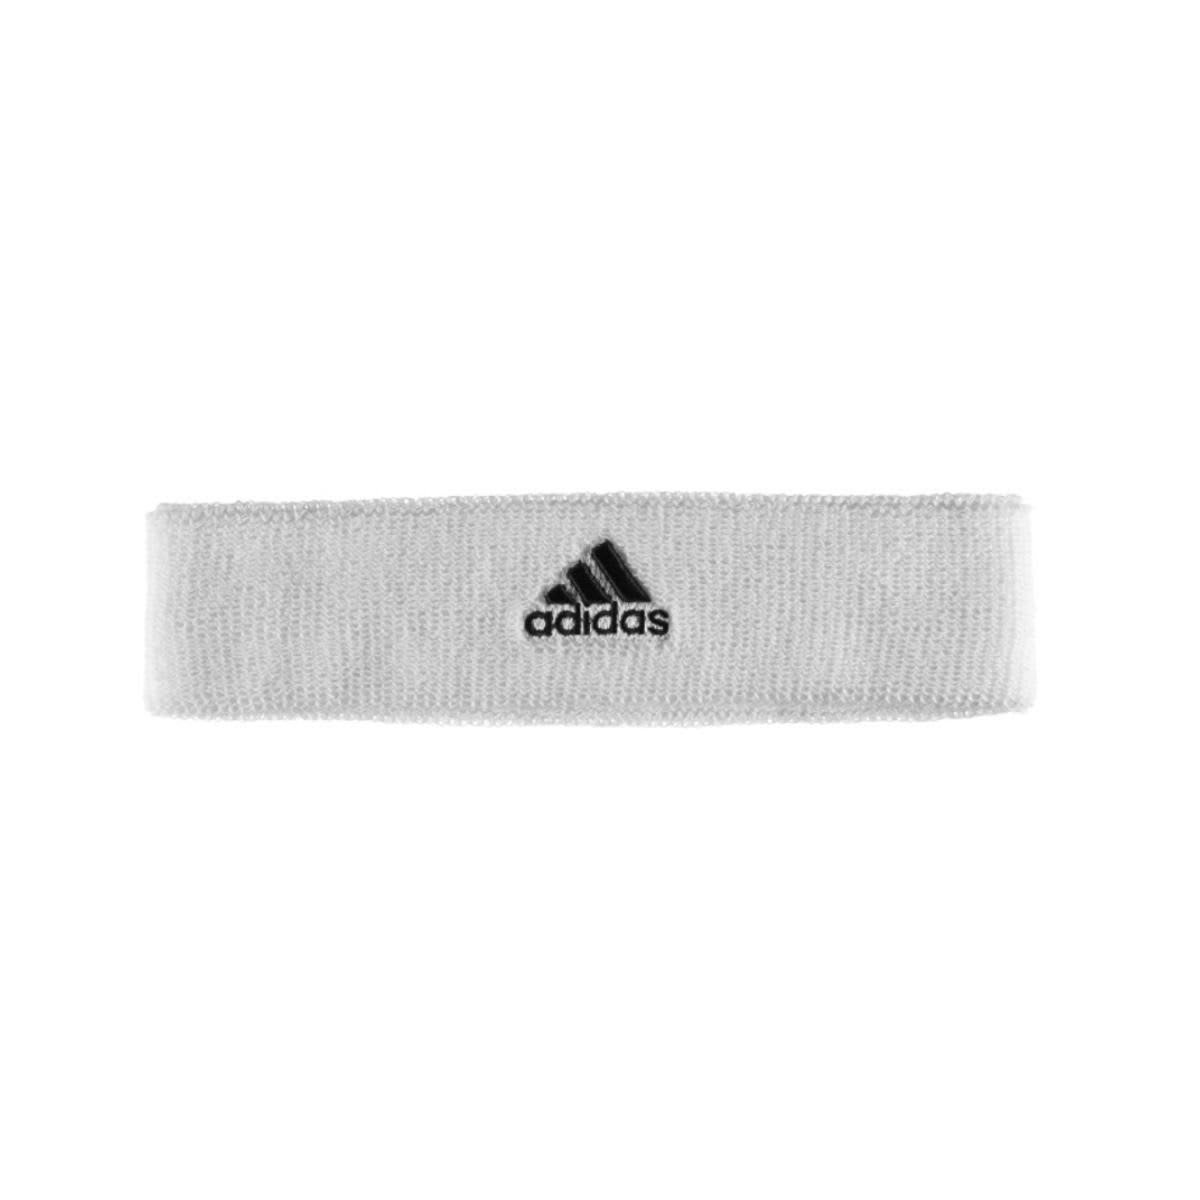 3b13abb5cd4cd Accessories   Headbands   Sportsmans Warehouse